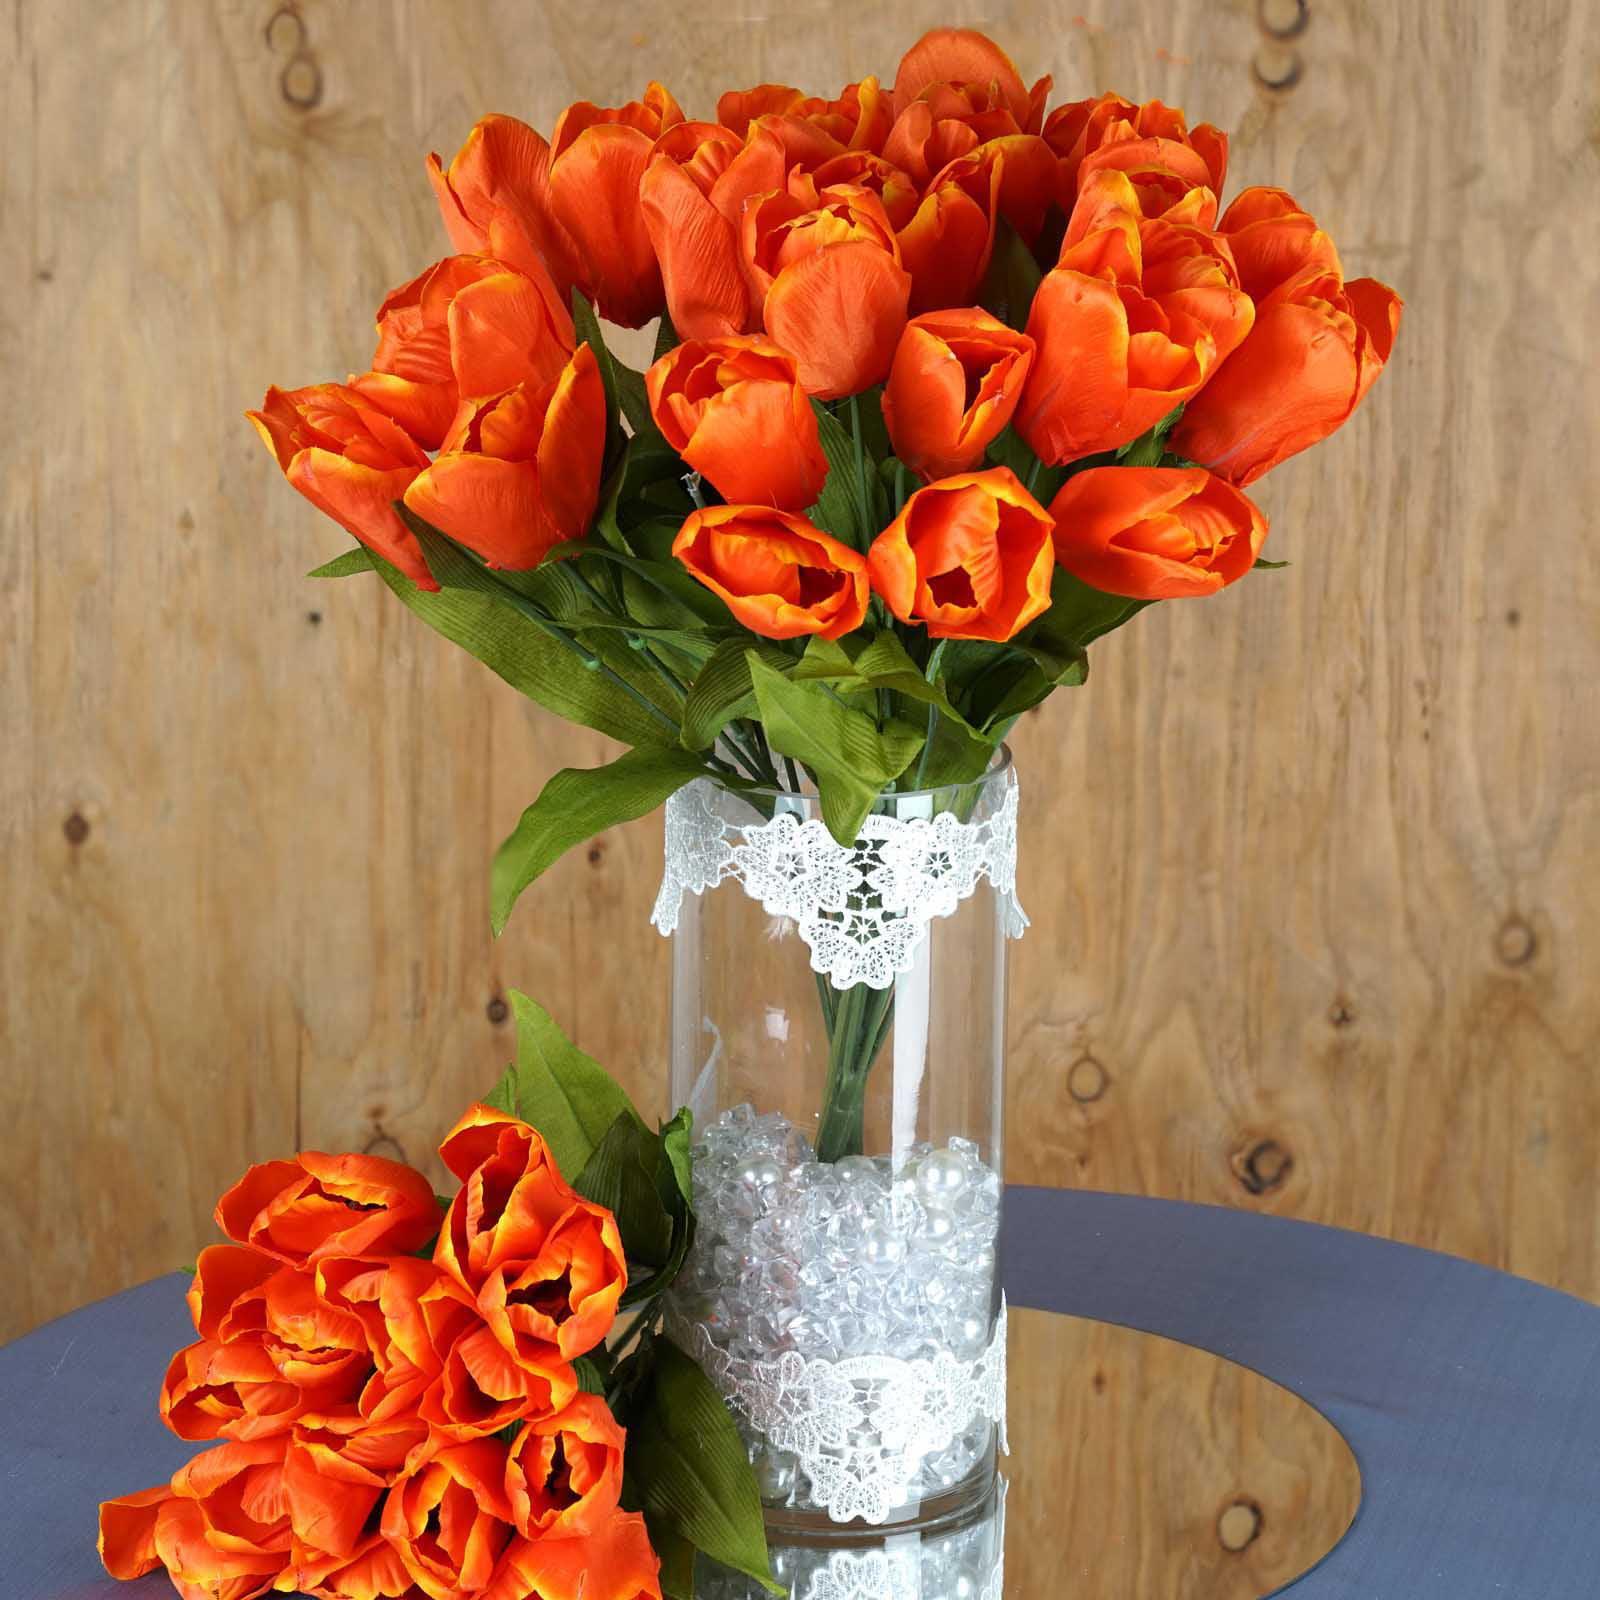 Efavormart 56 Tulips Artificial Artificial Wedding Flowers - 4 bushes